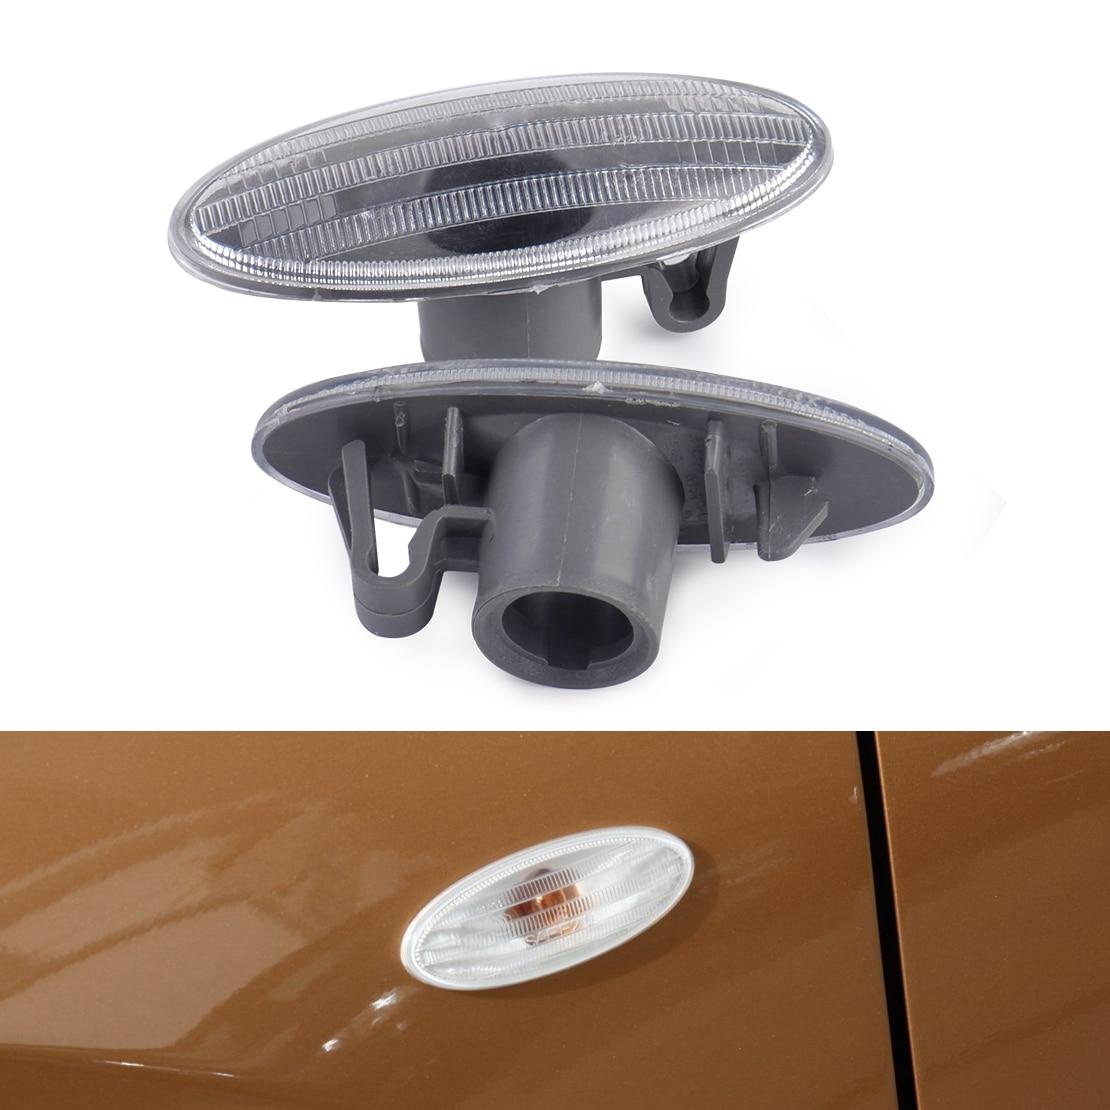 beler 1Pair Side Turn Signal Lamp Fender Marker Lights Cover 26160-89900 for Nissan Cube Juke Leaf Note Micra X-TRAIL 2011-2013